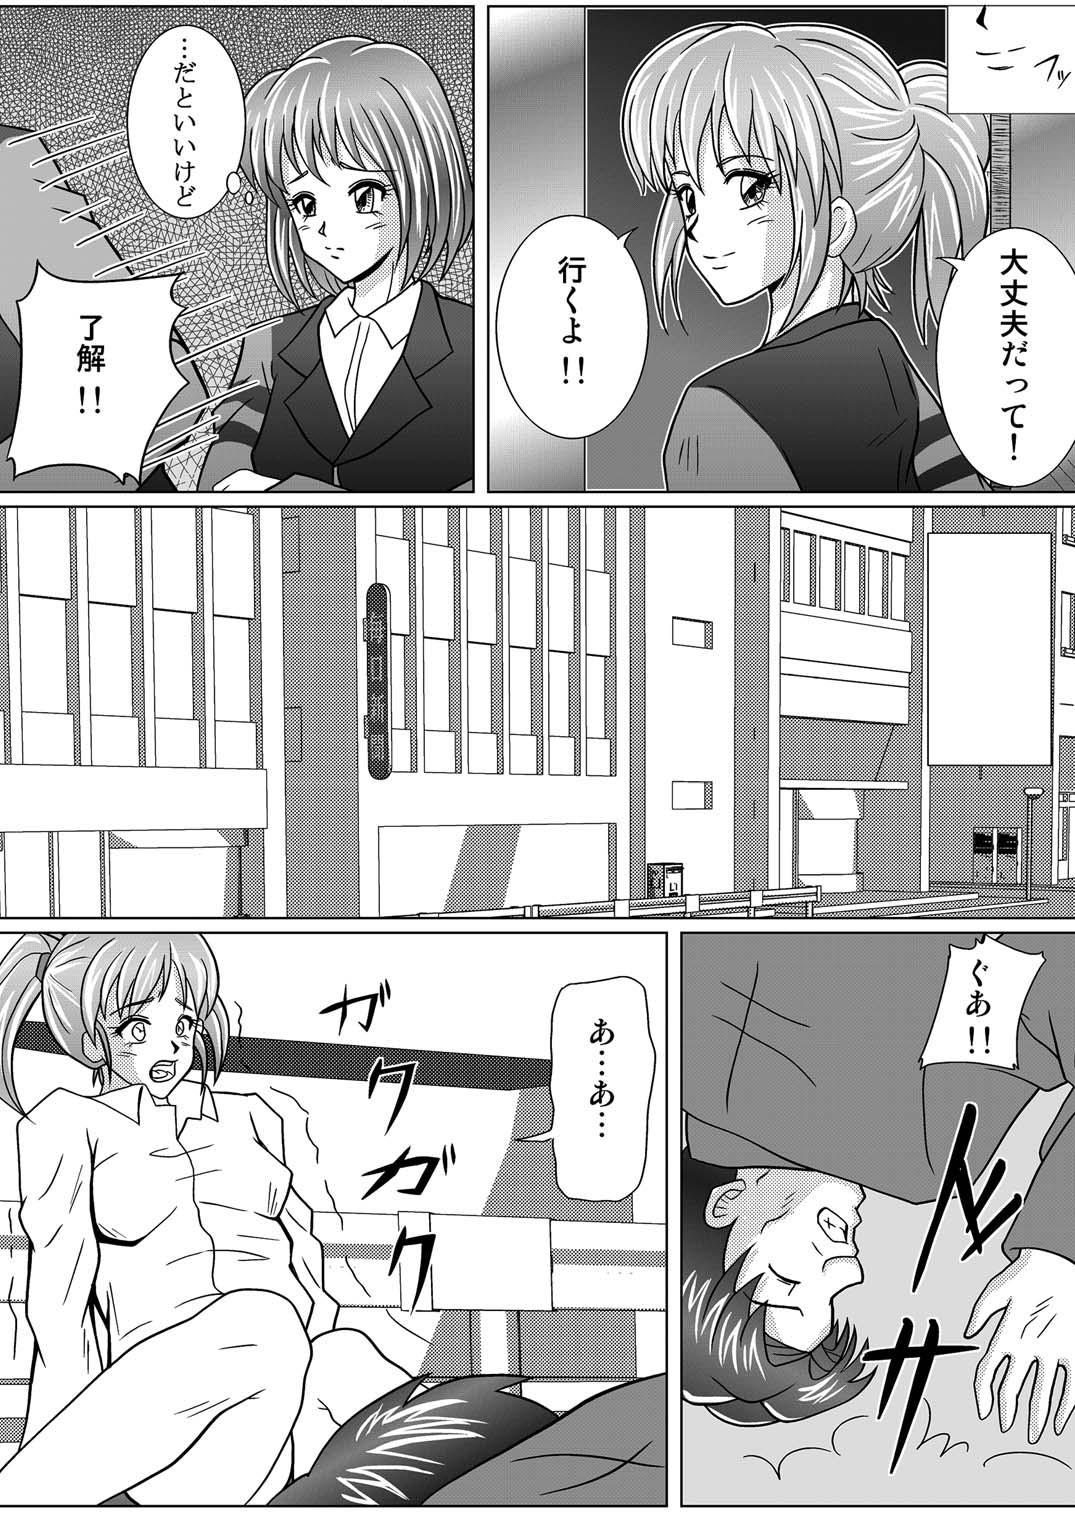 [Macxe's (monmon)] Tokubousentai Dinaranger ~Heroine Kairaku Sennou Keikaku~ Vol.01/02/03 (Renkaban) [Digital] 10